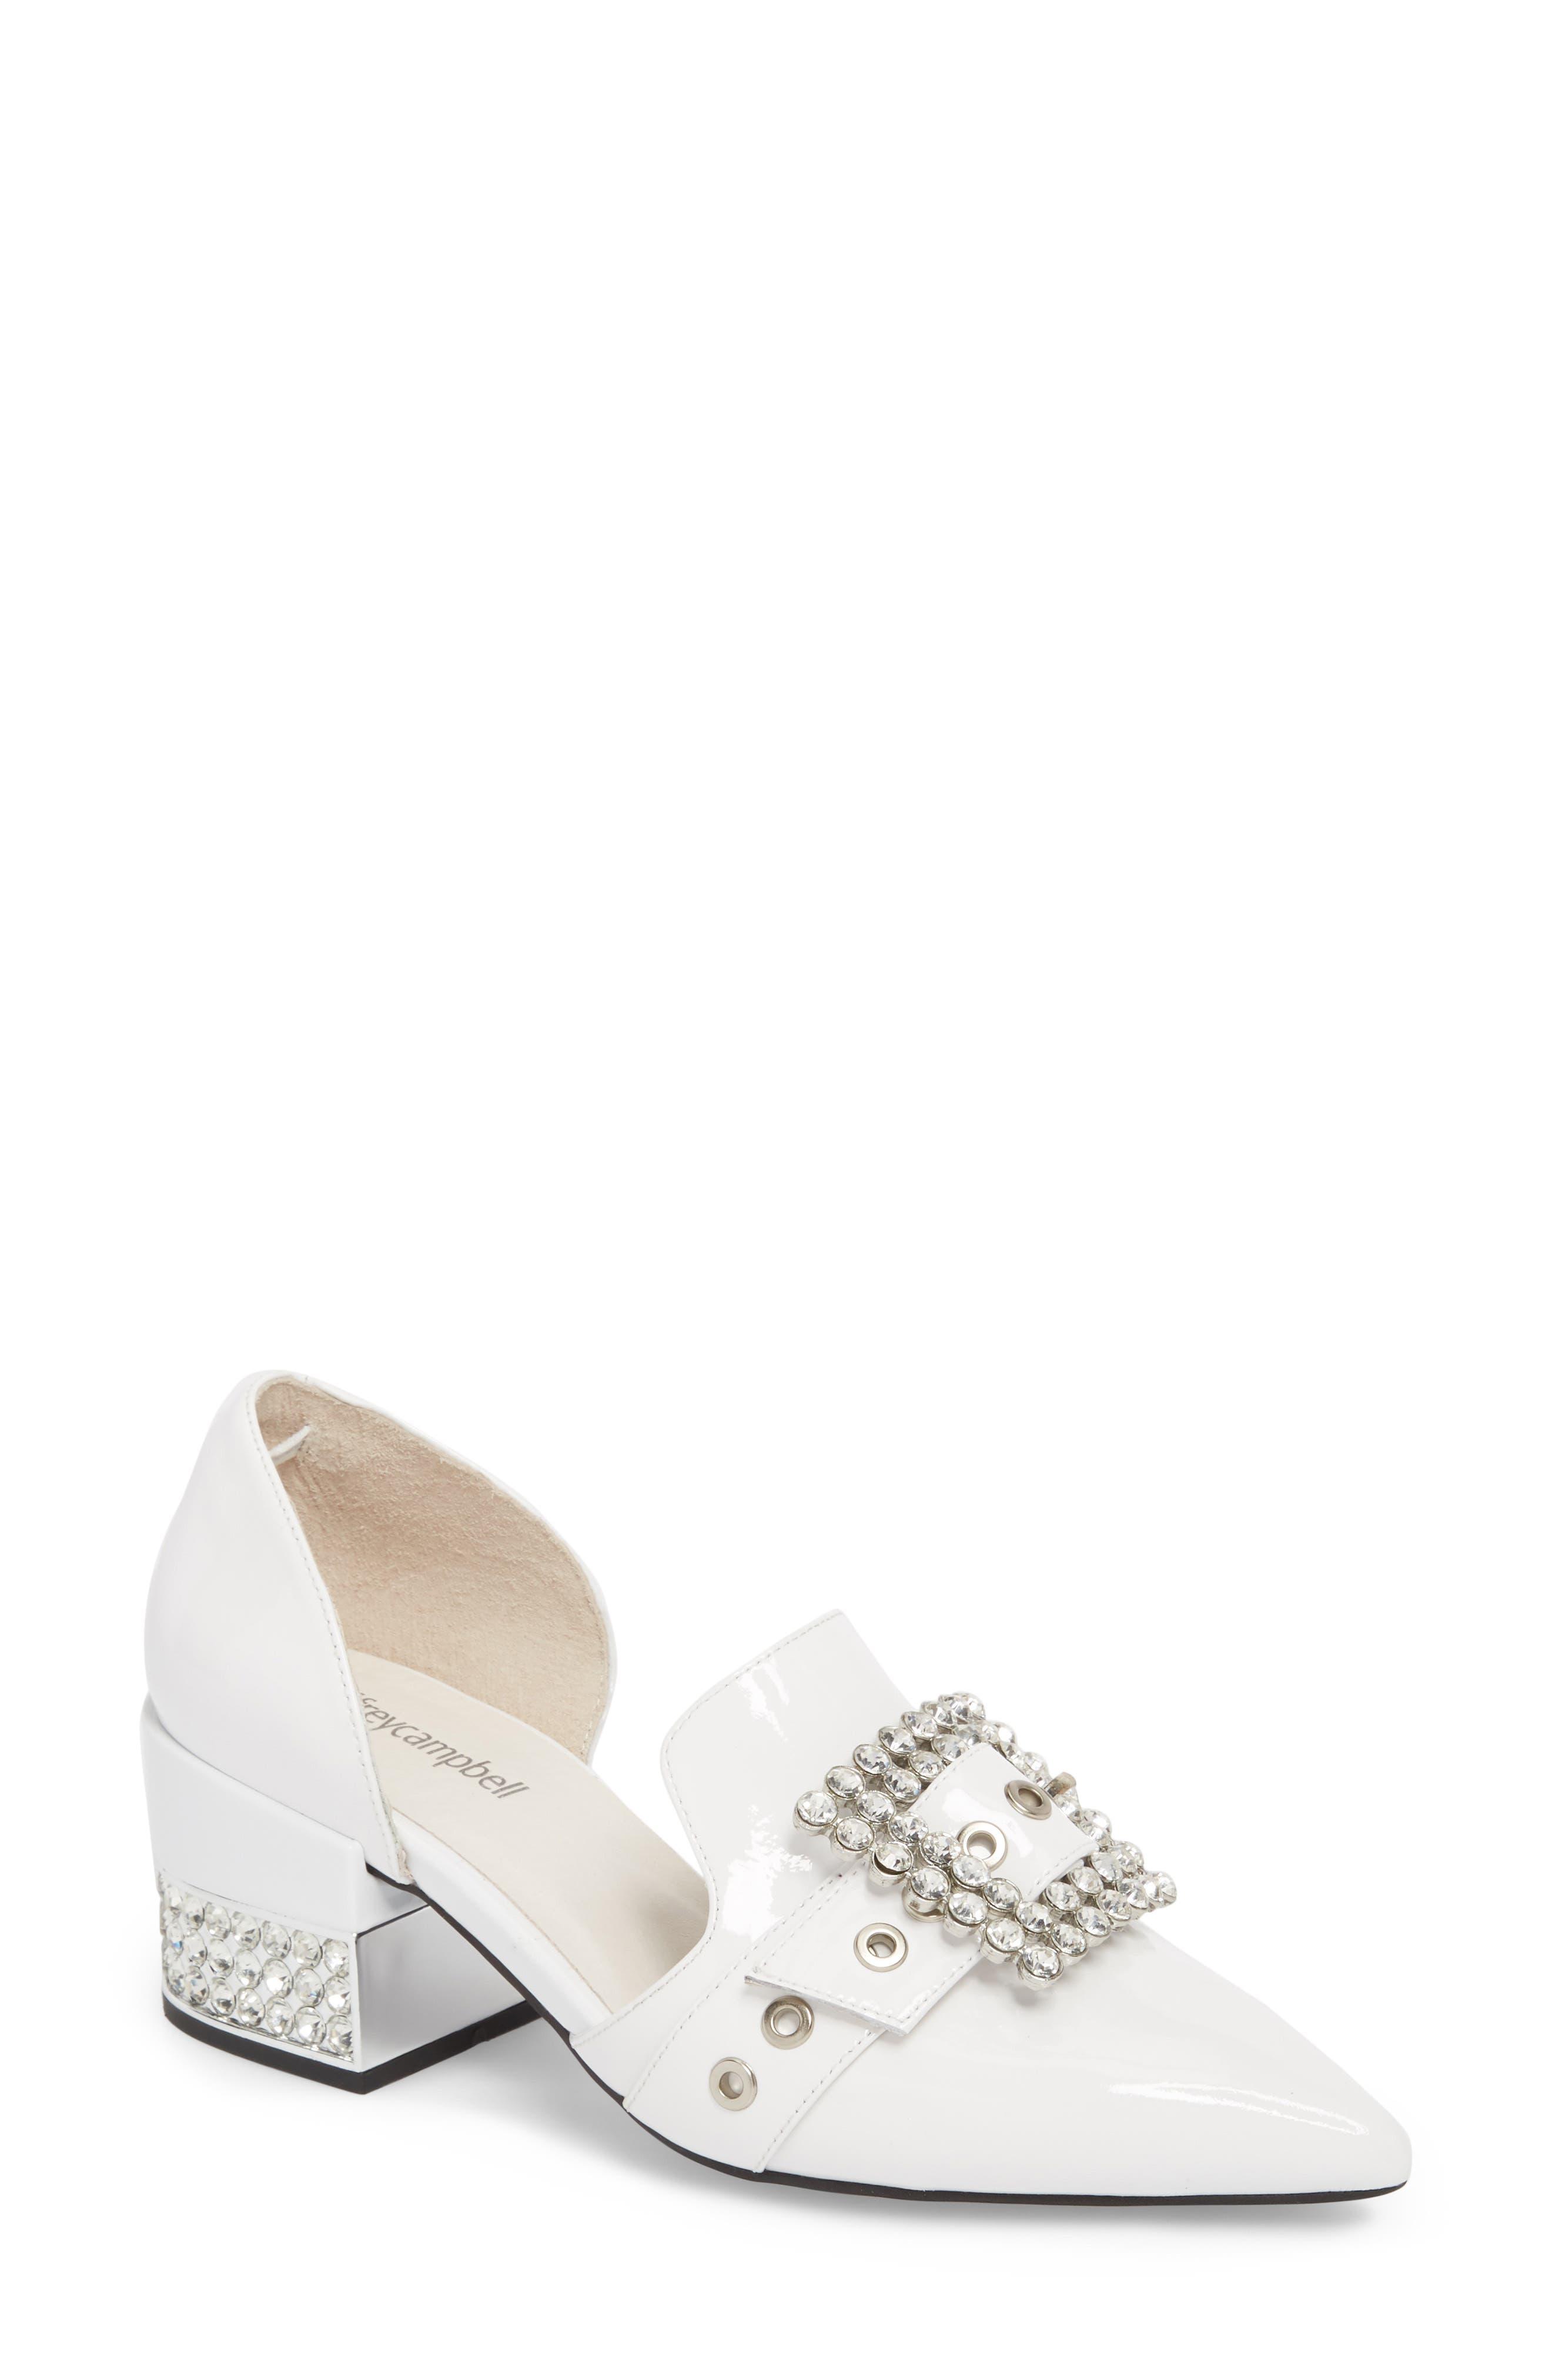 Zofia Jeweled Heel Pump,                             Main thumbnail 1, color,                             White Patent Silver